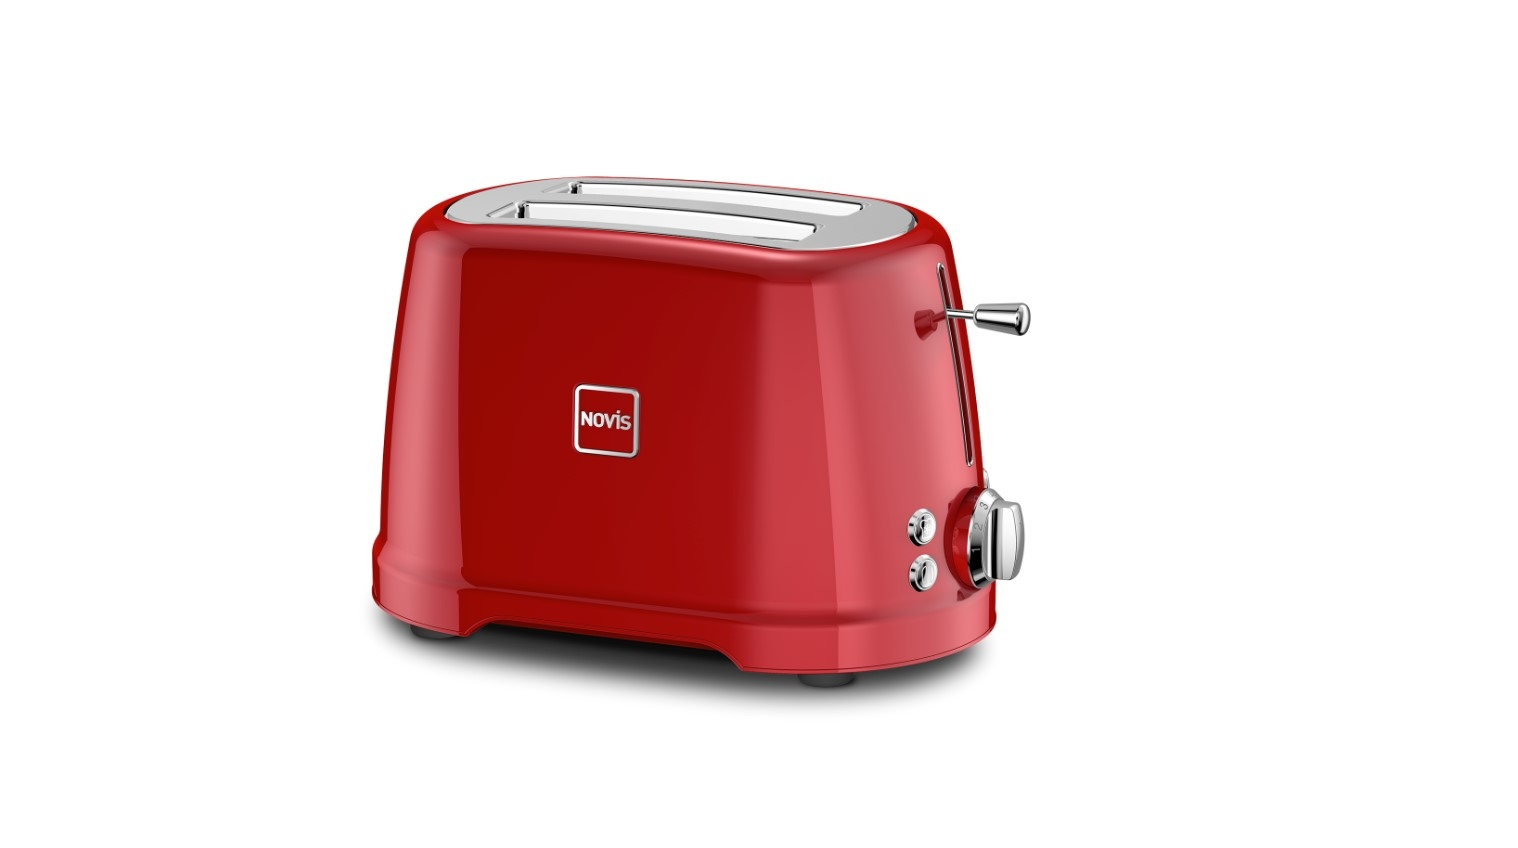 Toaster 2 sloturi, 4 functii, 900W, Novis T2 Rosu imagine